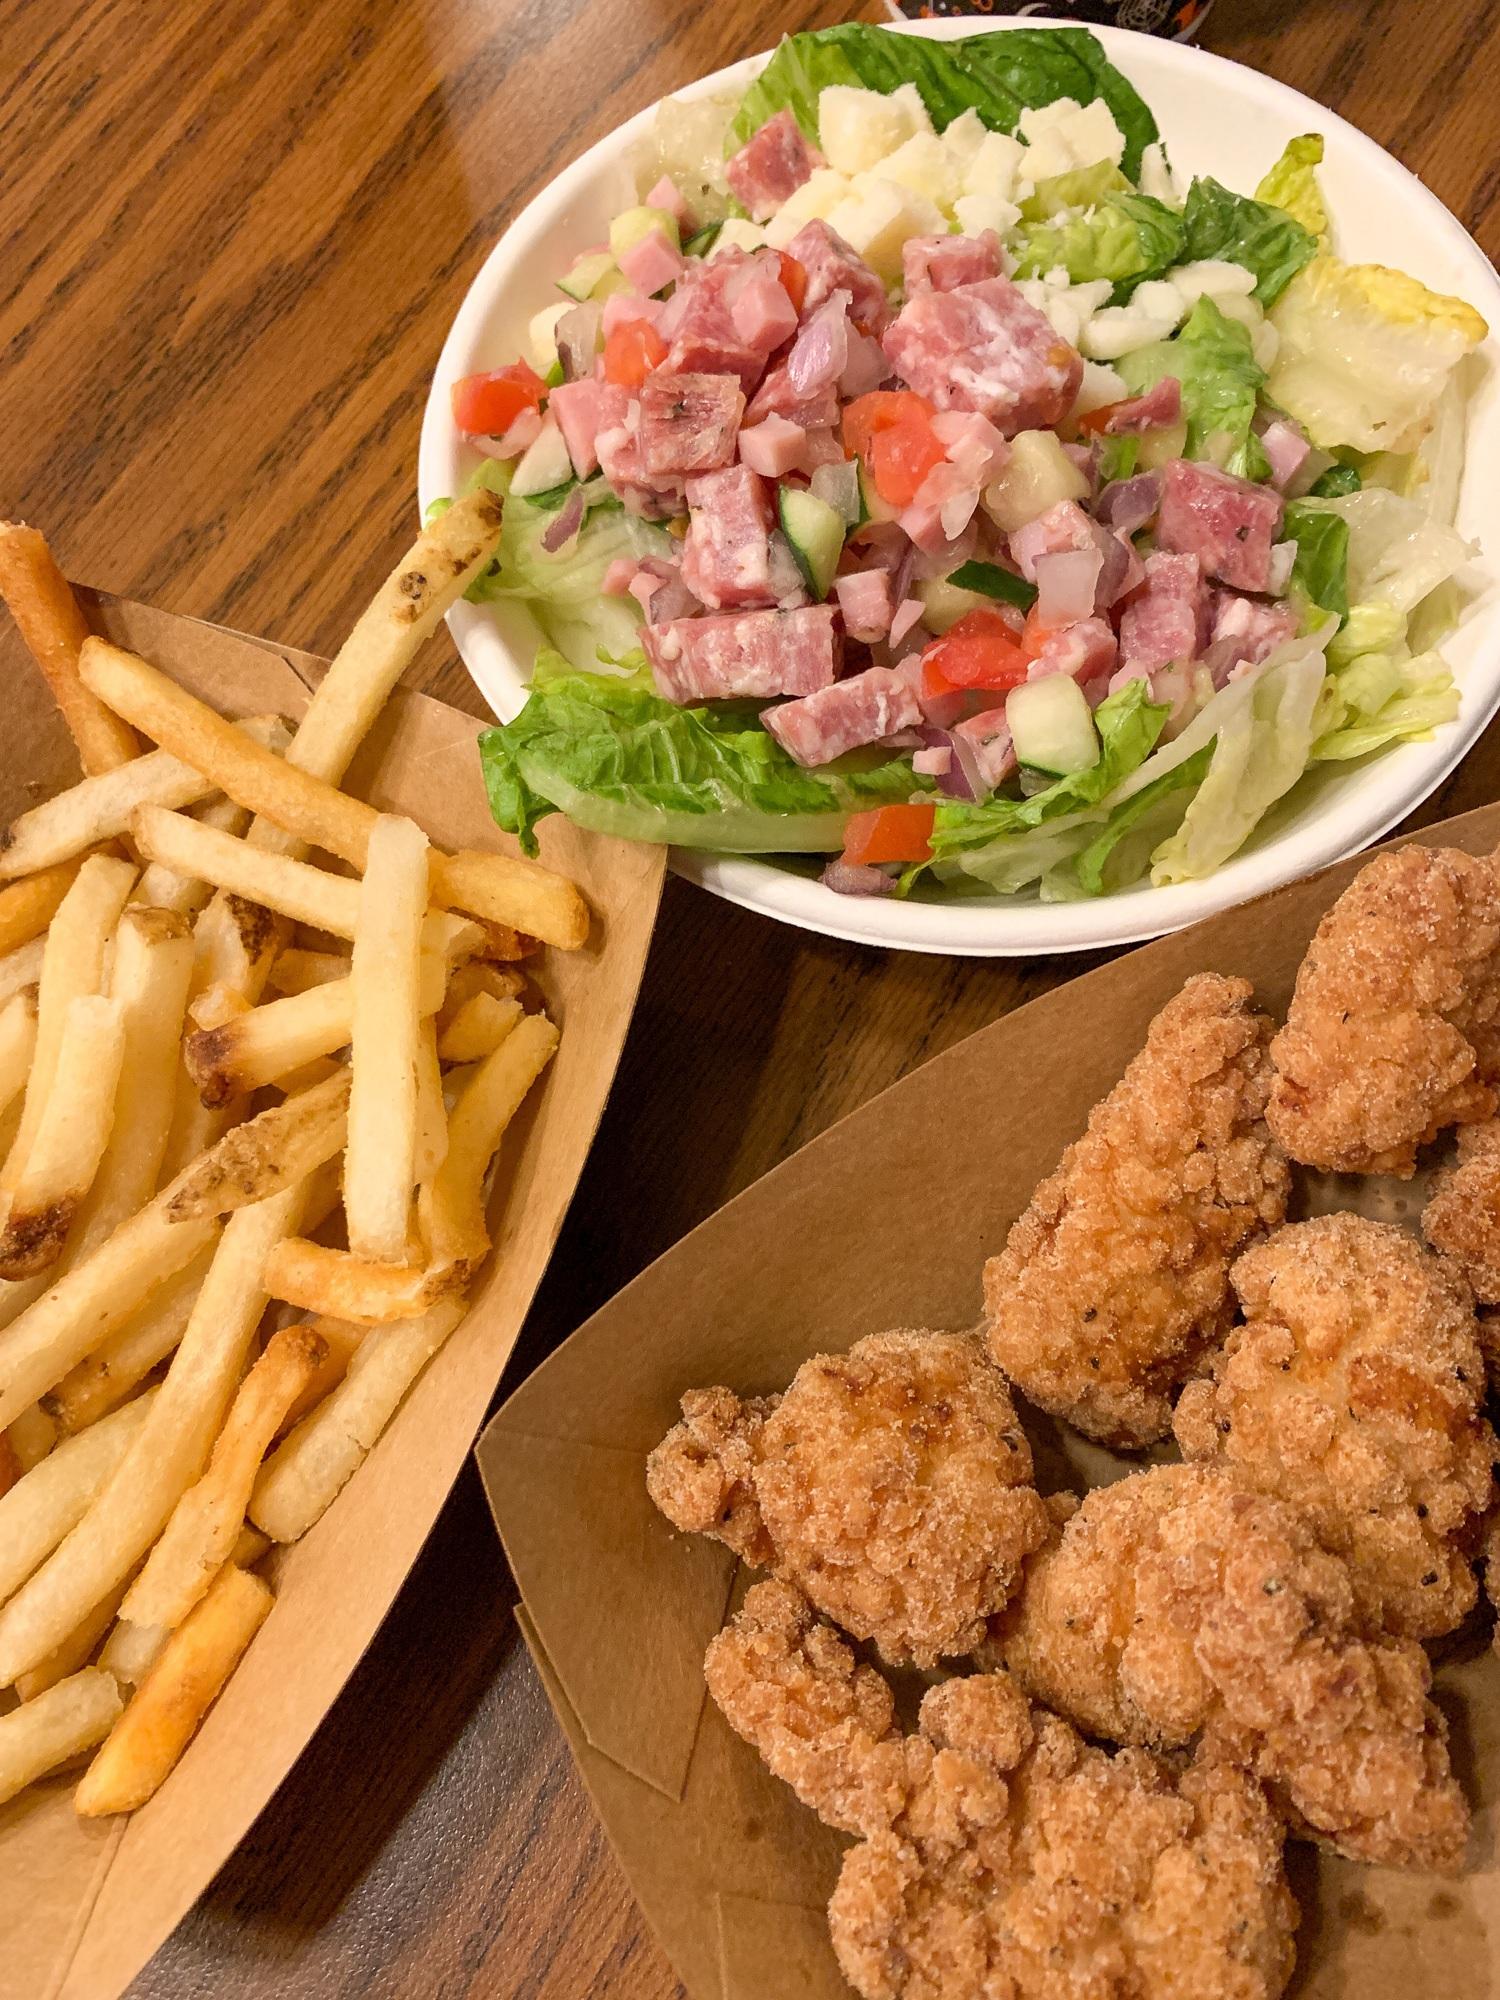 Quick service meal at Walt Disney World